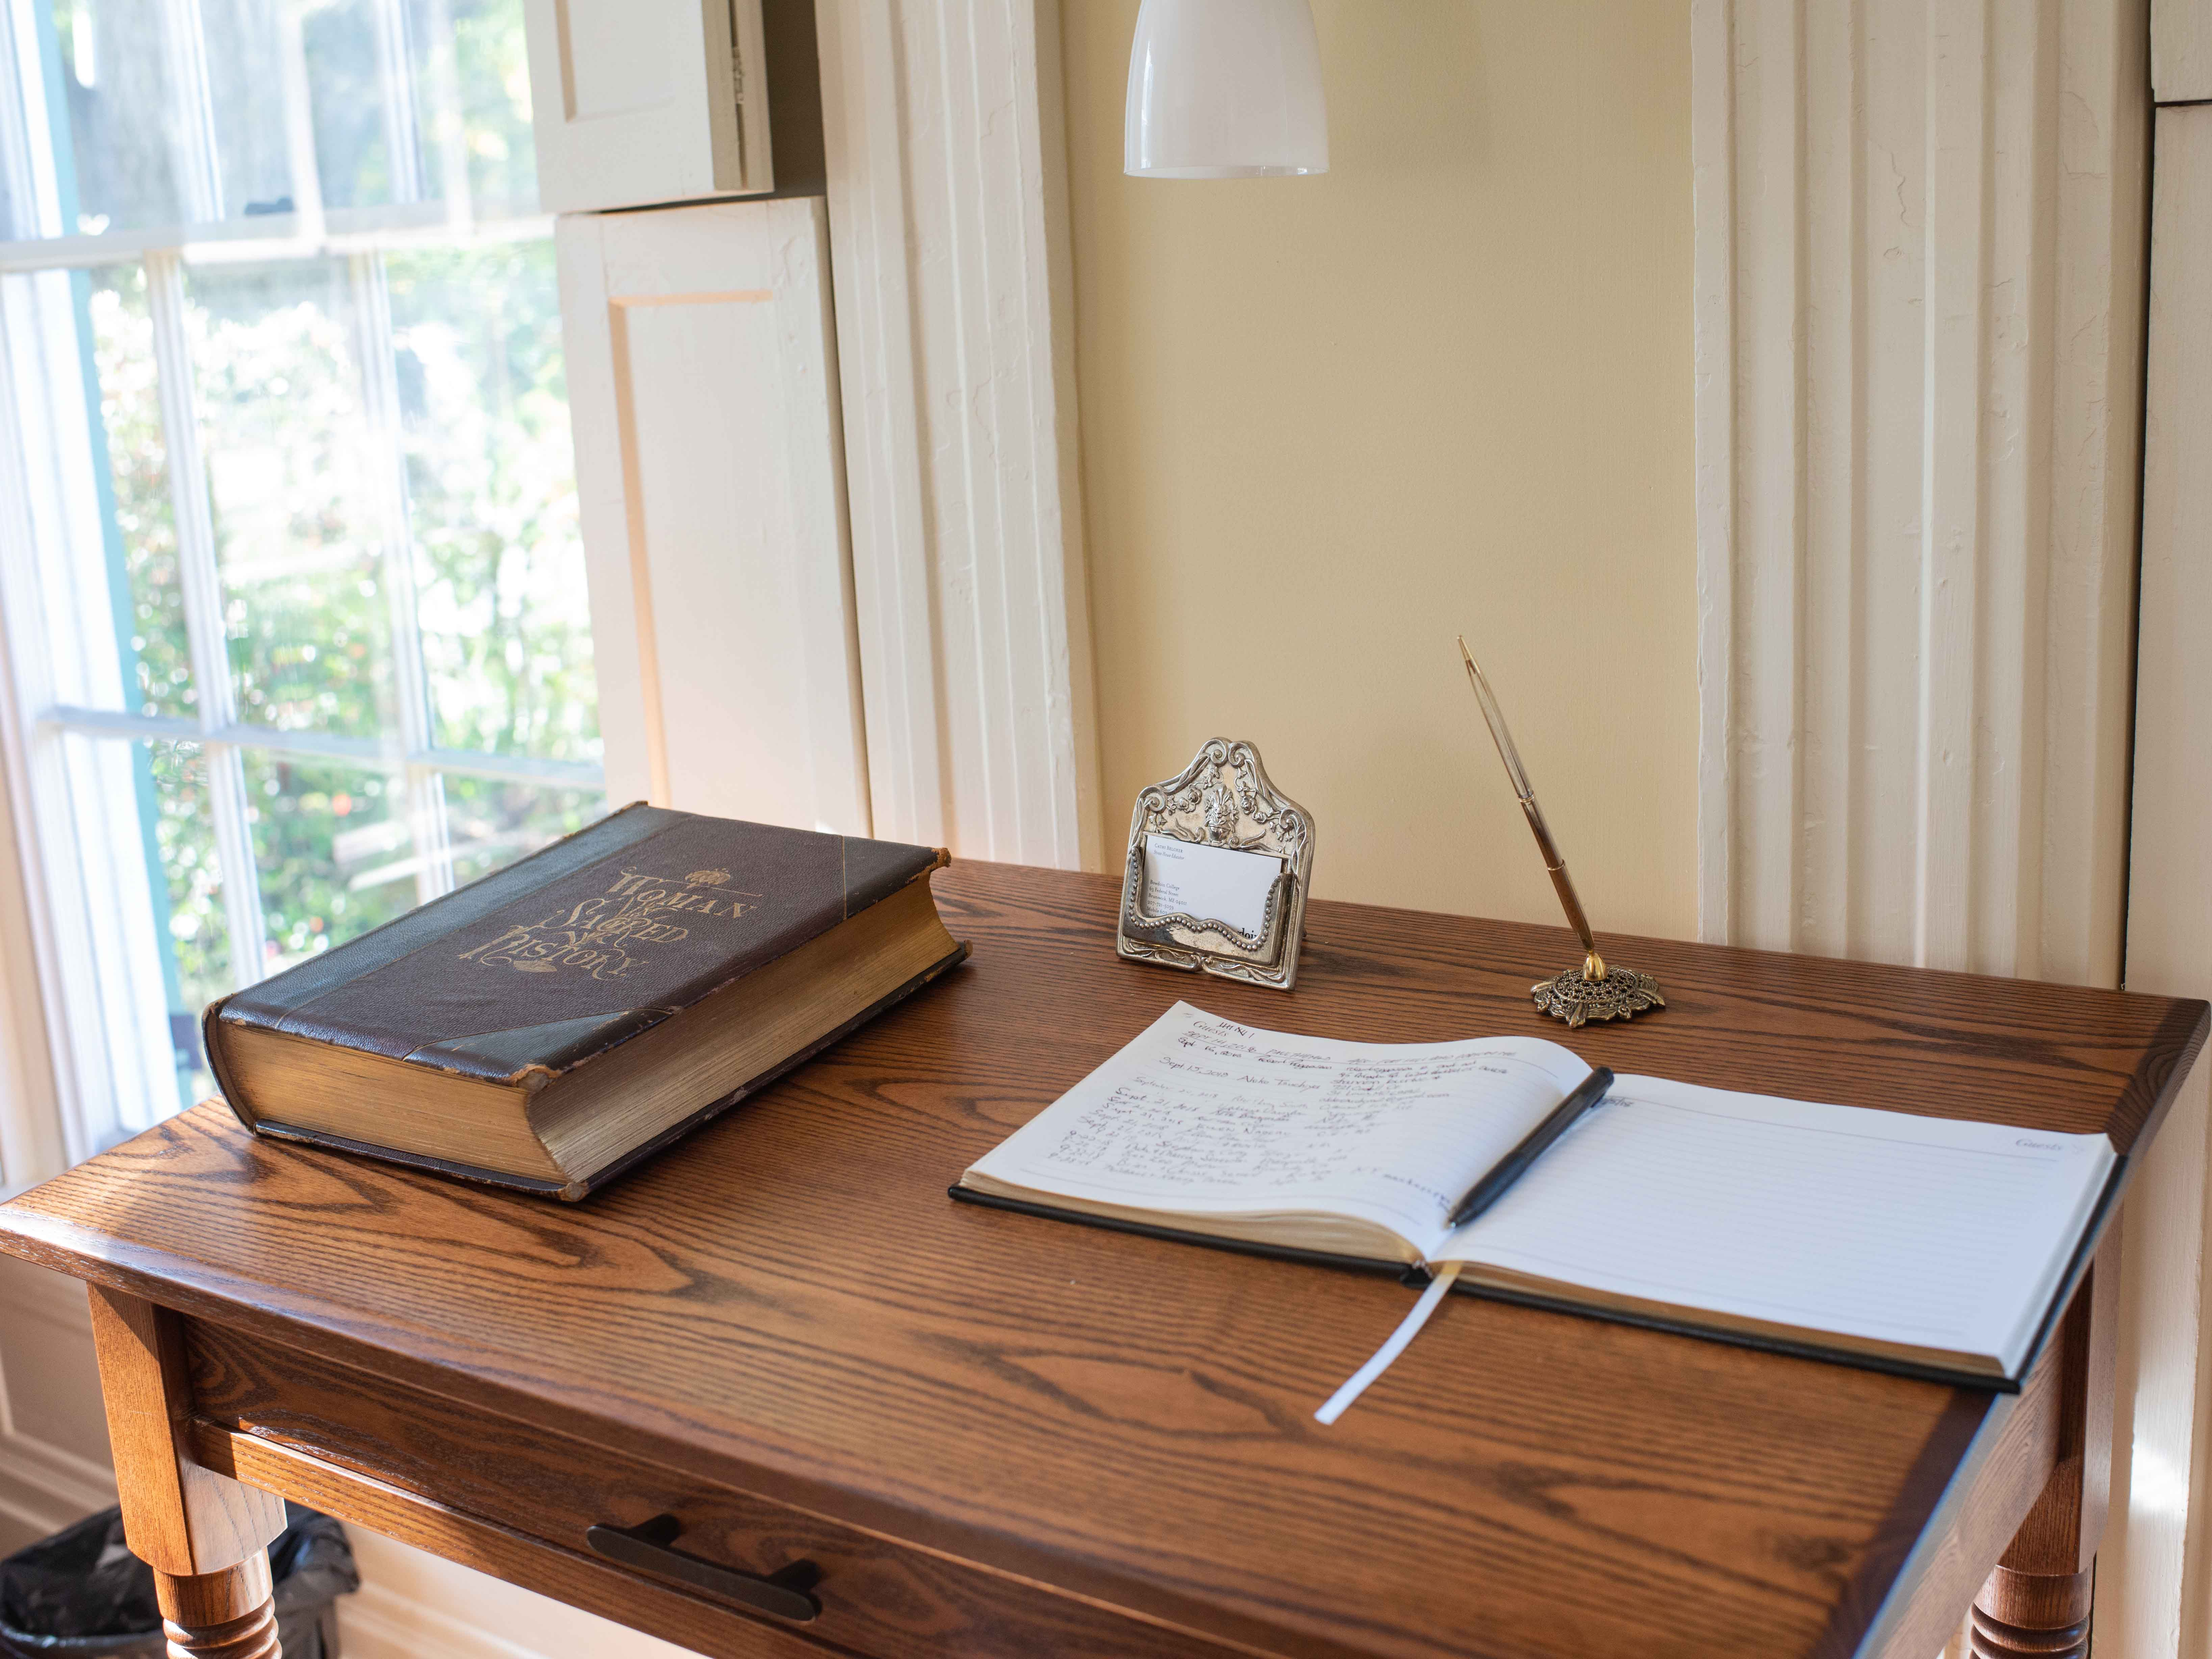 Harriet Beecher Stowe House | Bowdoin College